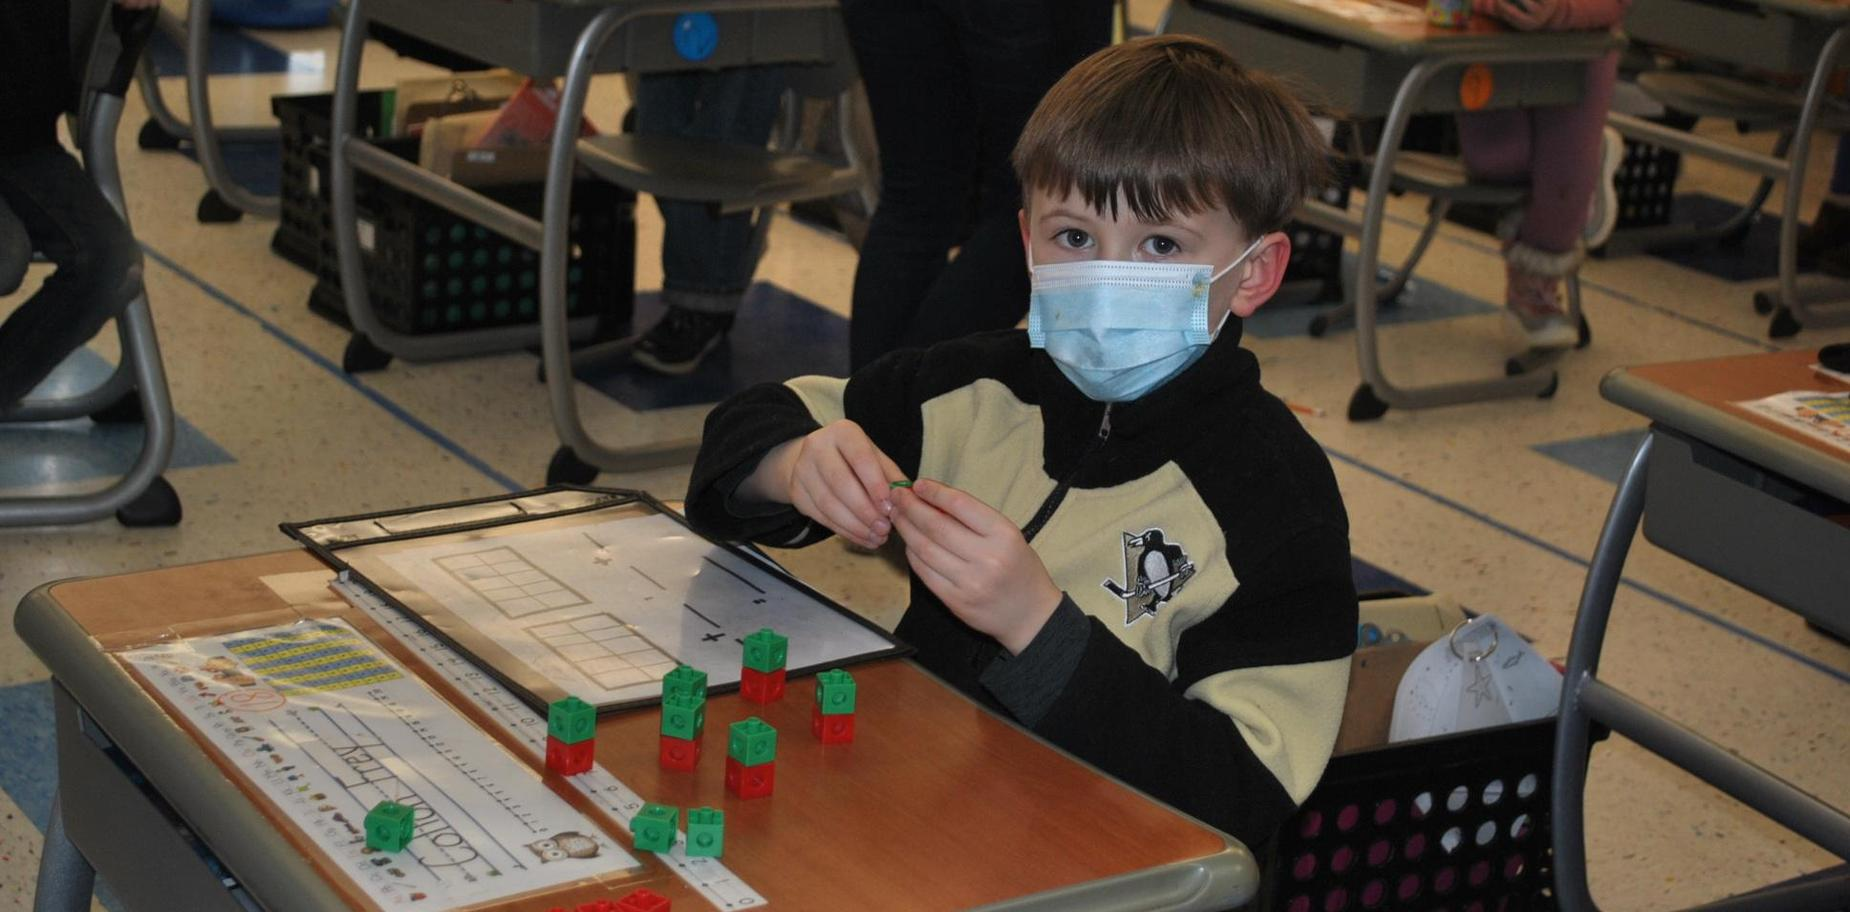 boy doing math with manipulatives